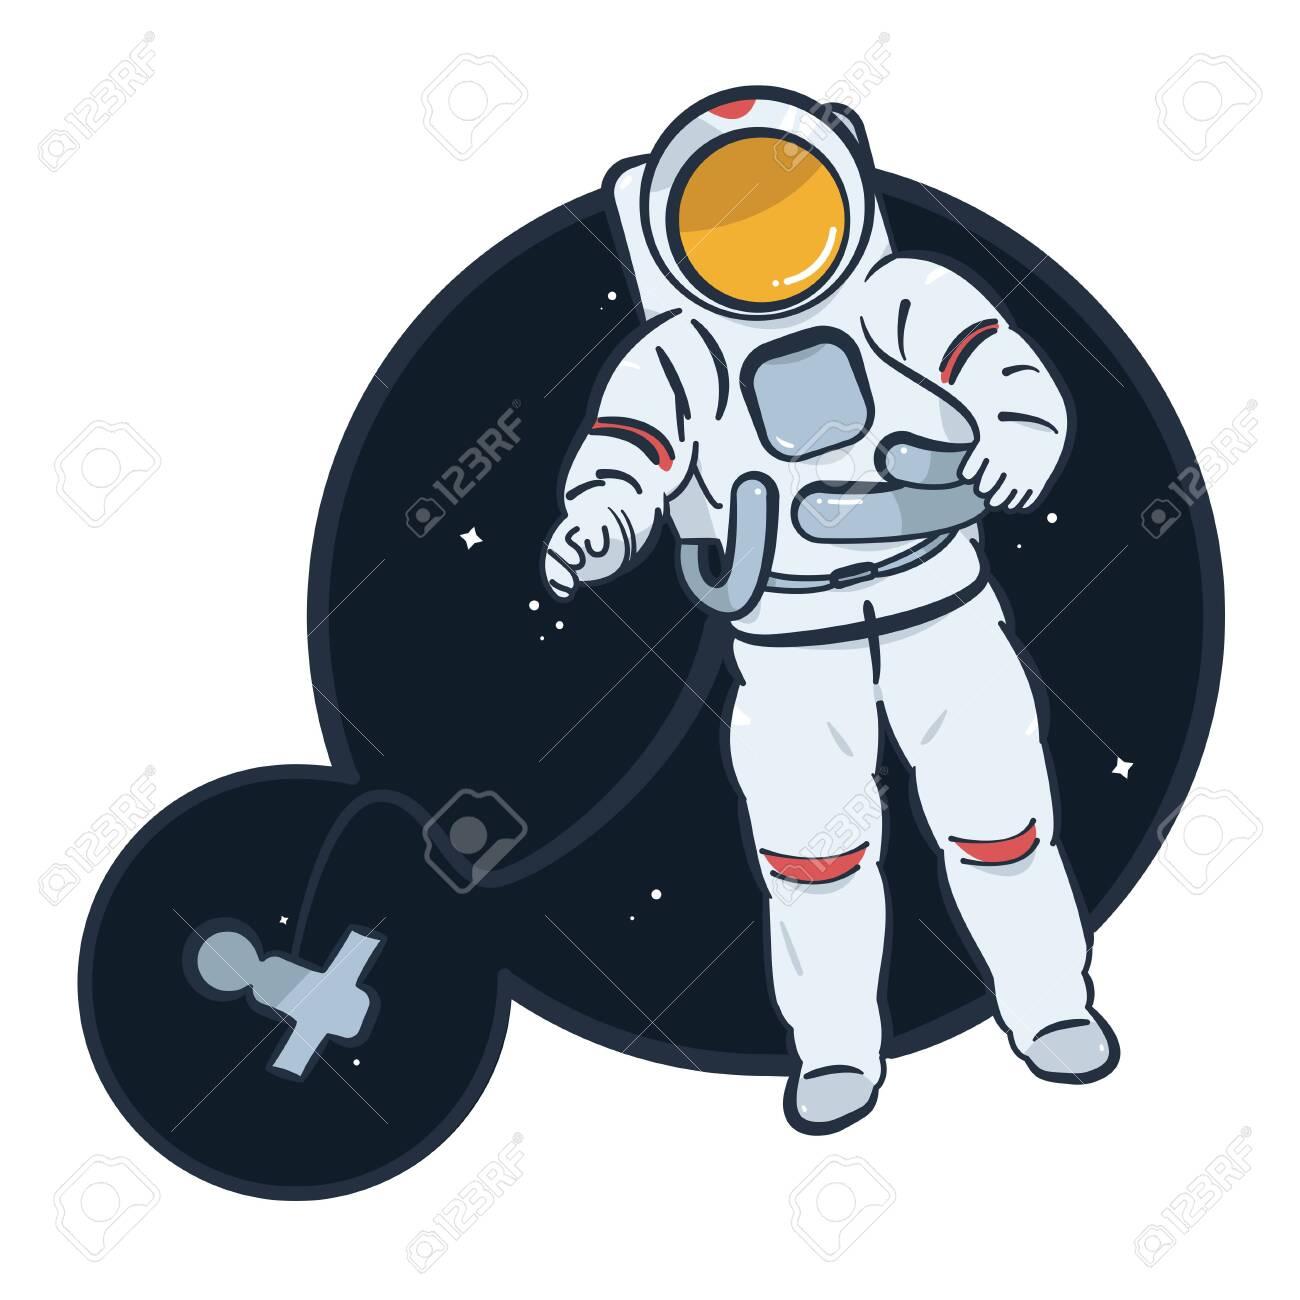 Cosmic icon illustration. - 133967537